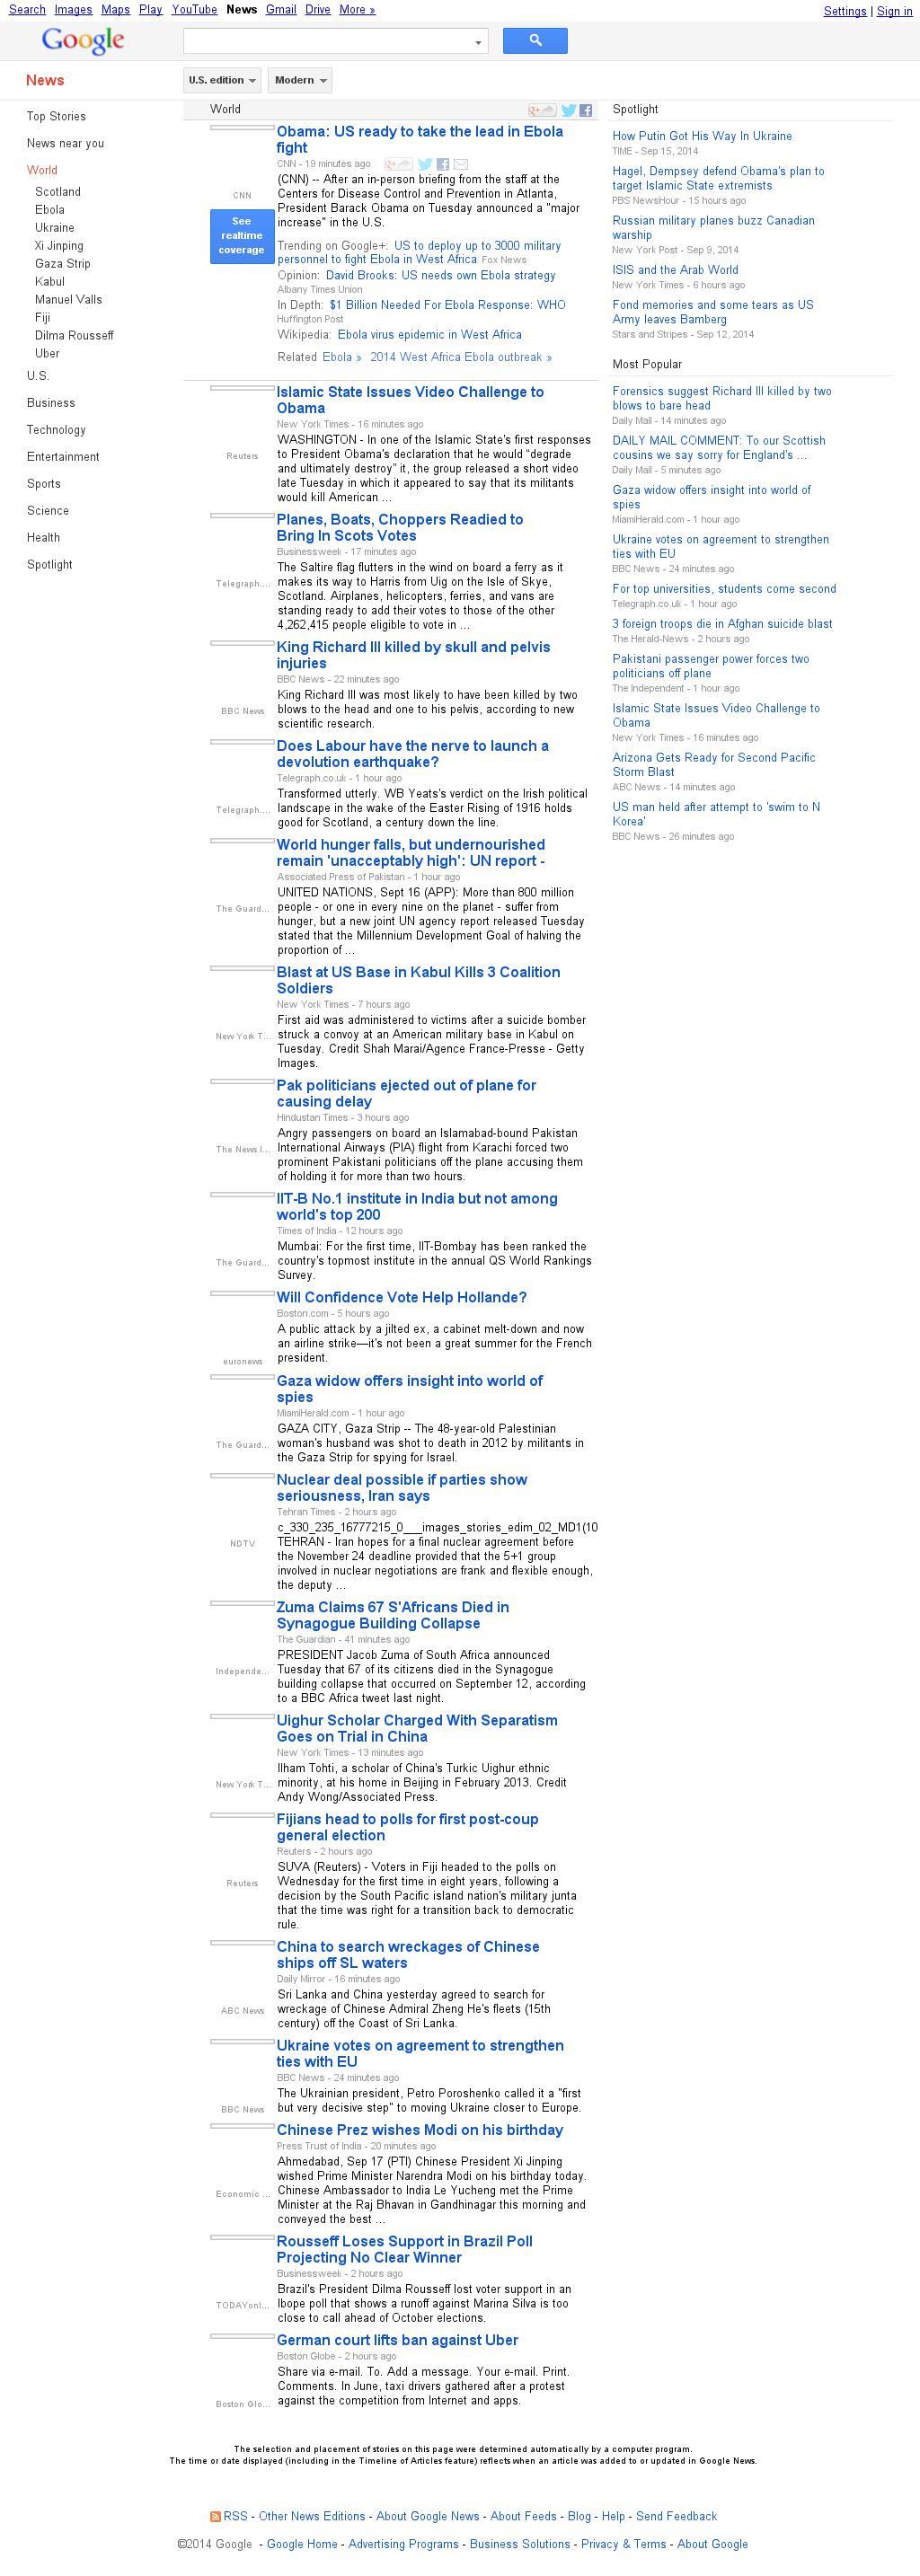 Google News: World at Wednesday Sept. 17, 2014, 7:08 a.m. UTC